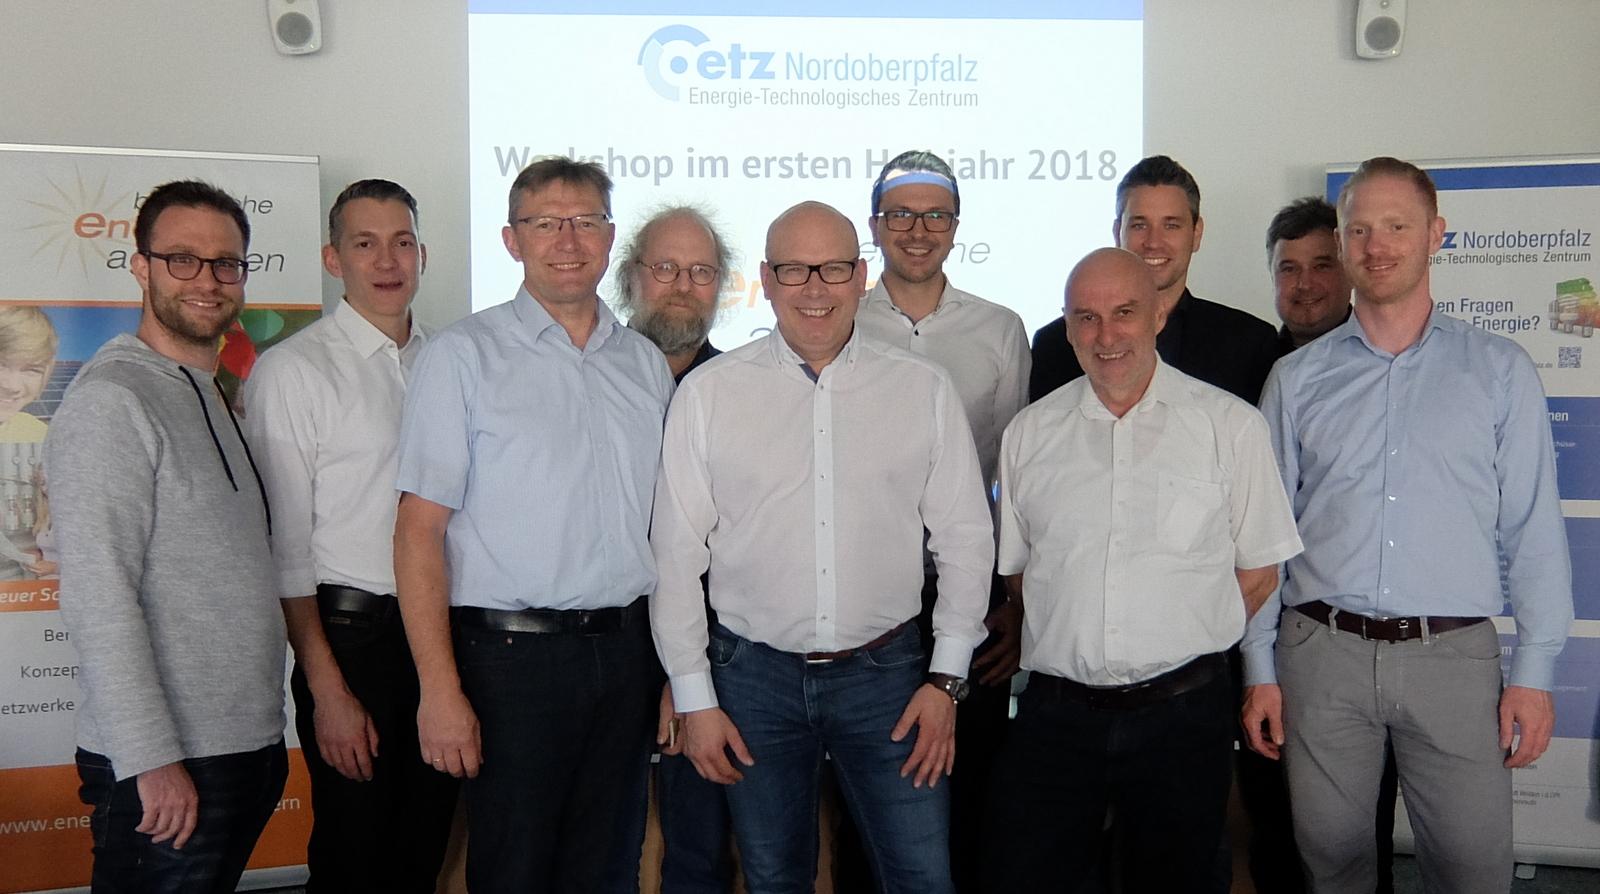 v.l.: Richard Röck, Marc Gasper, Ludwig Friedl, Peter Pospischil, Matthias Rösch, Stefan Drexlmeier, Hans Gröbmayr, Sebastian Zirngibl, Roland Mäckle, Willie Stiehler